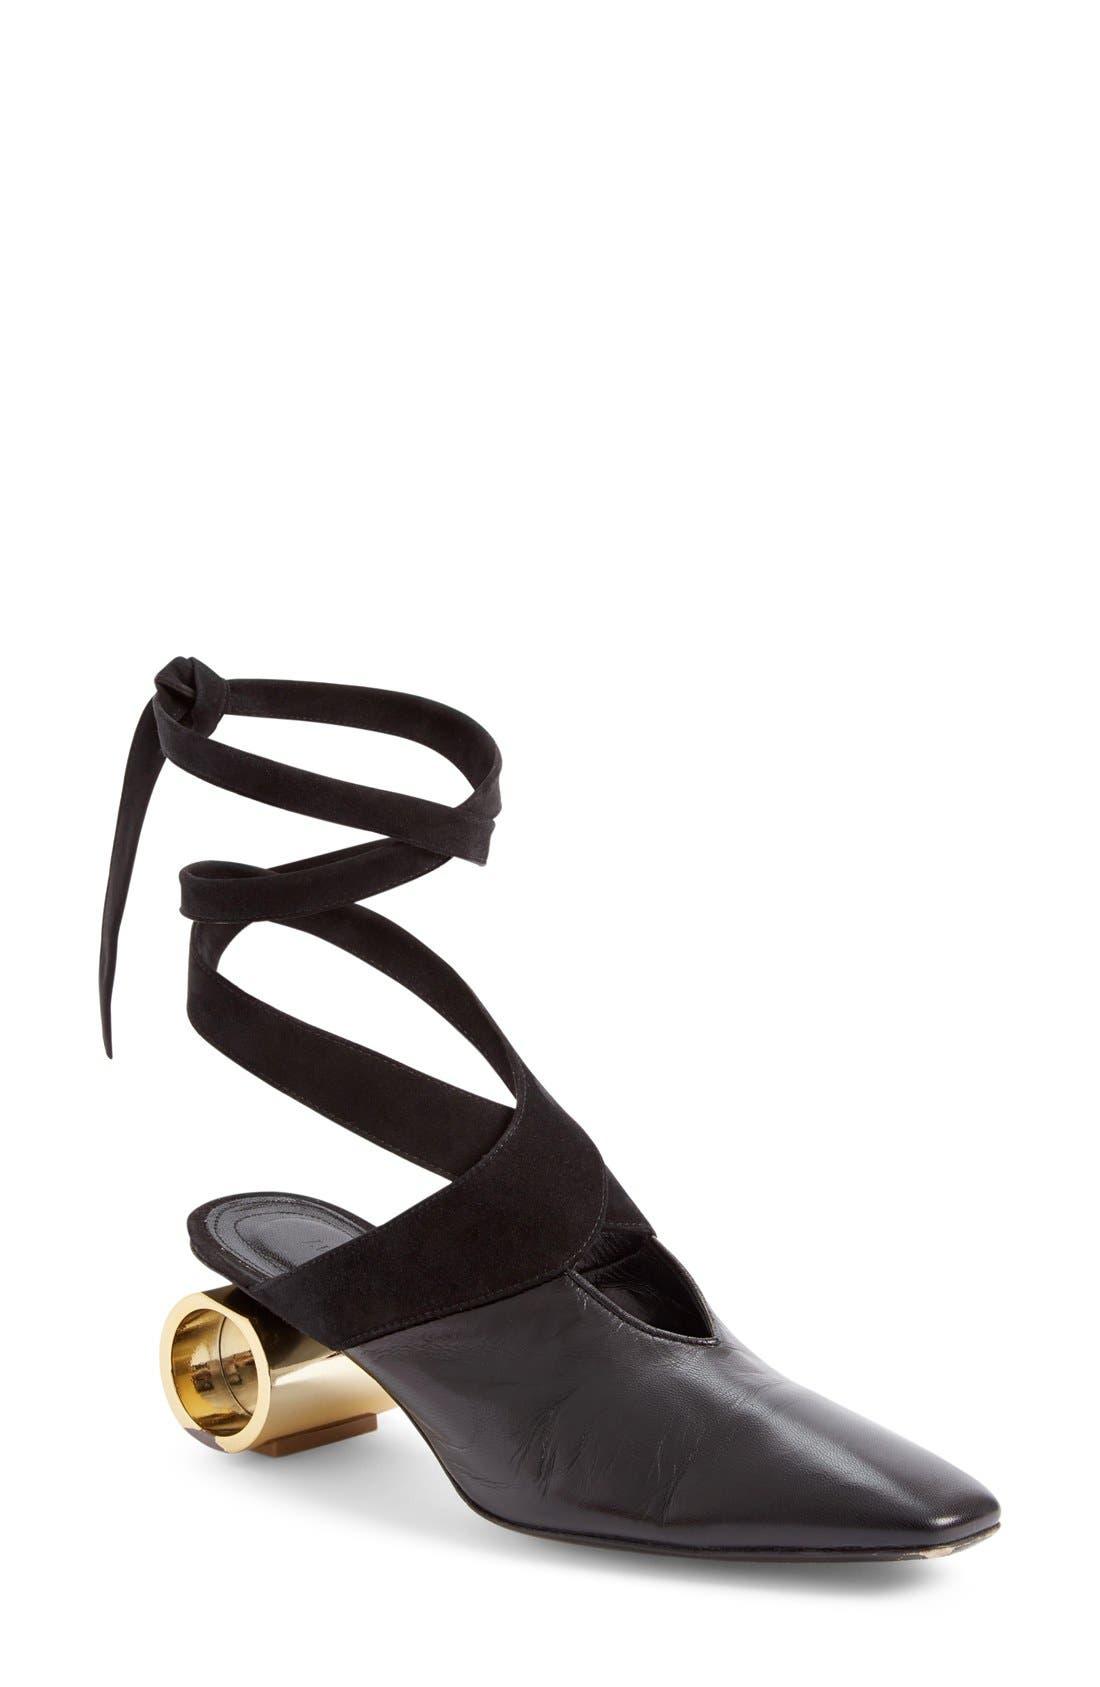 Main Image - J.W.ANDERSON Cylinder Heel Ballet Slide (Women)